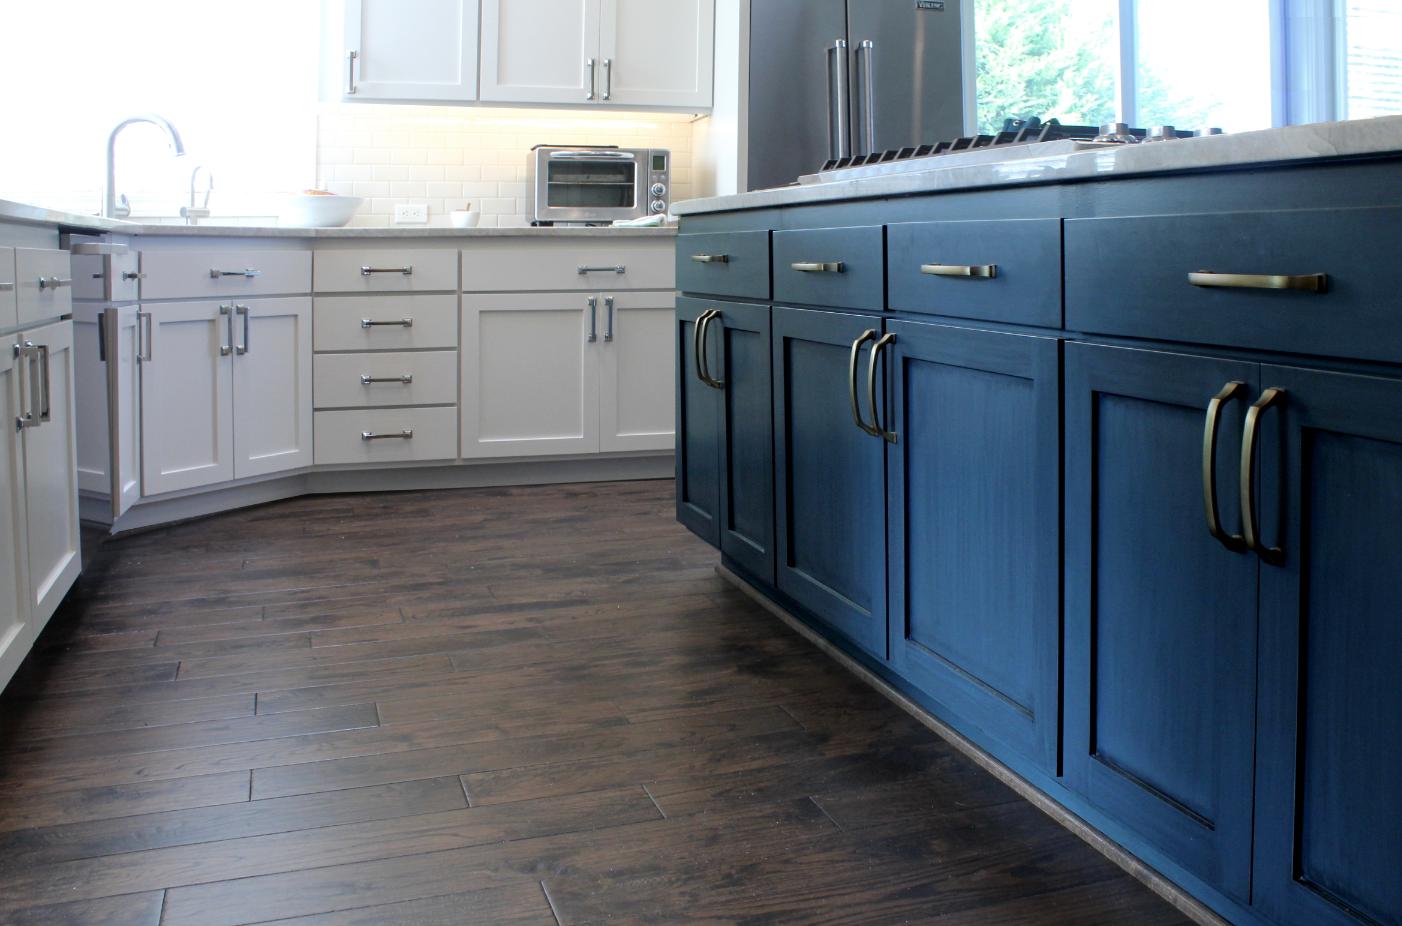 Main Cabinets Color Is Benjamin Moore Paint Color Pale Oak